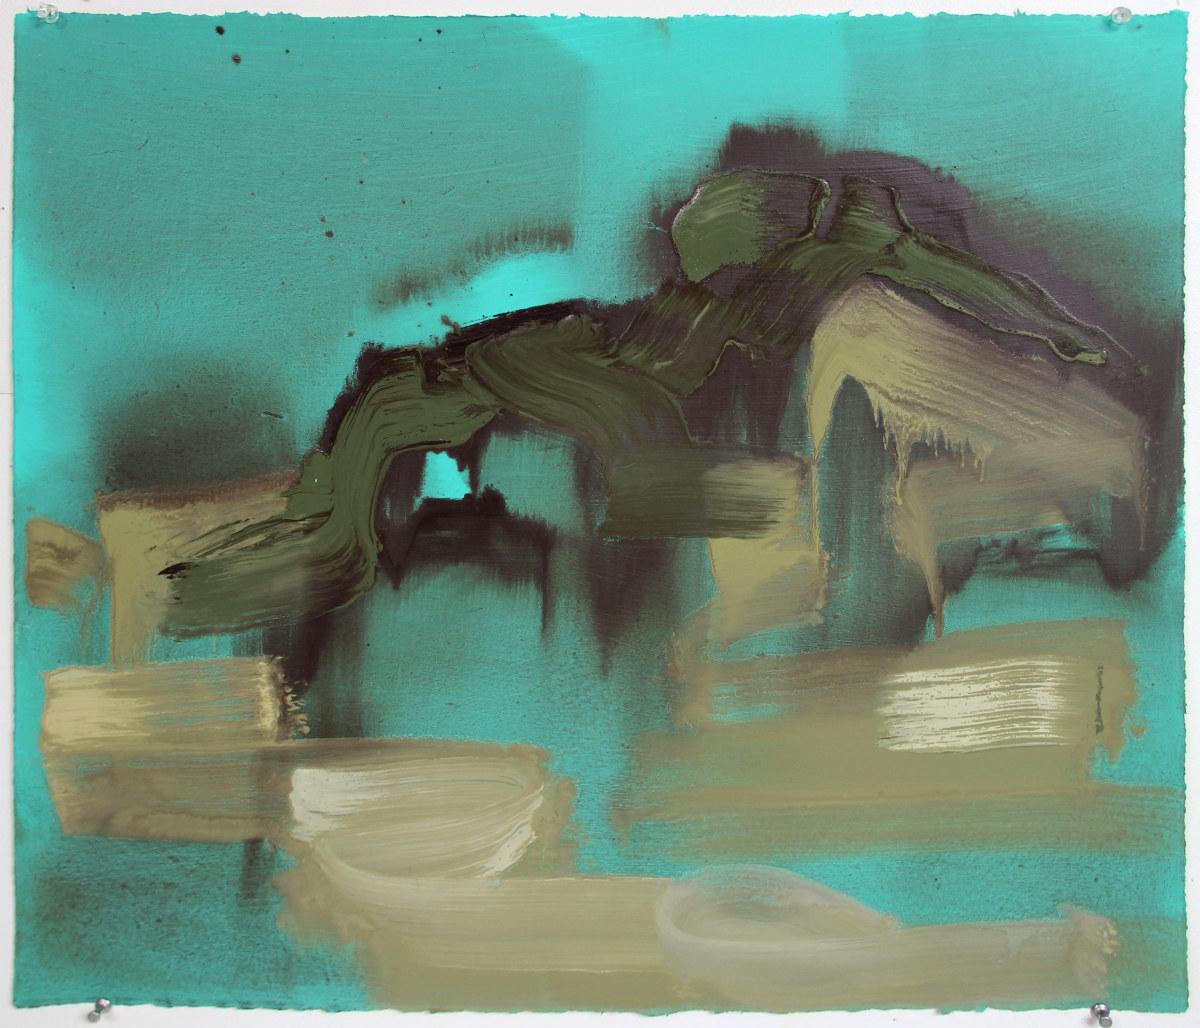 Abstract Landscape (ocean 4) by Pamela Staker